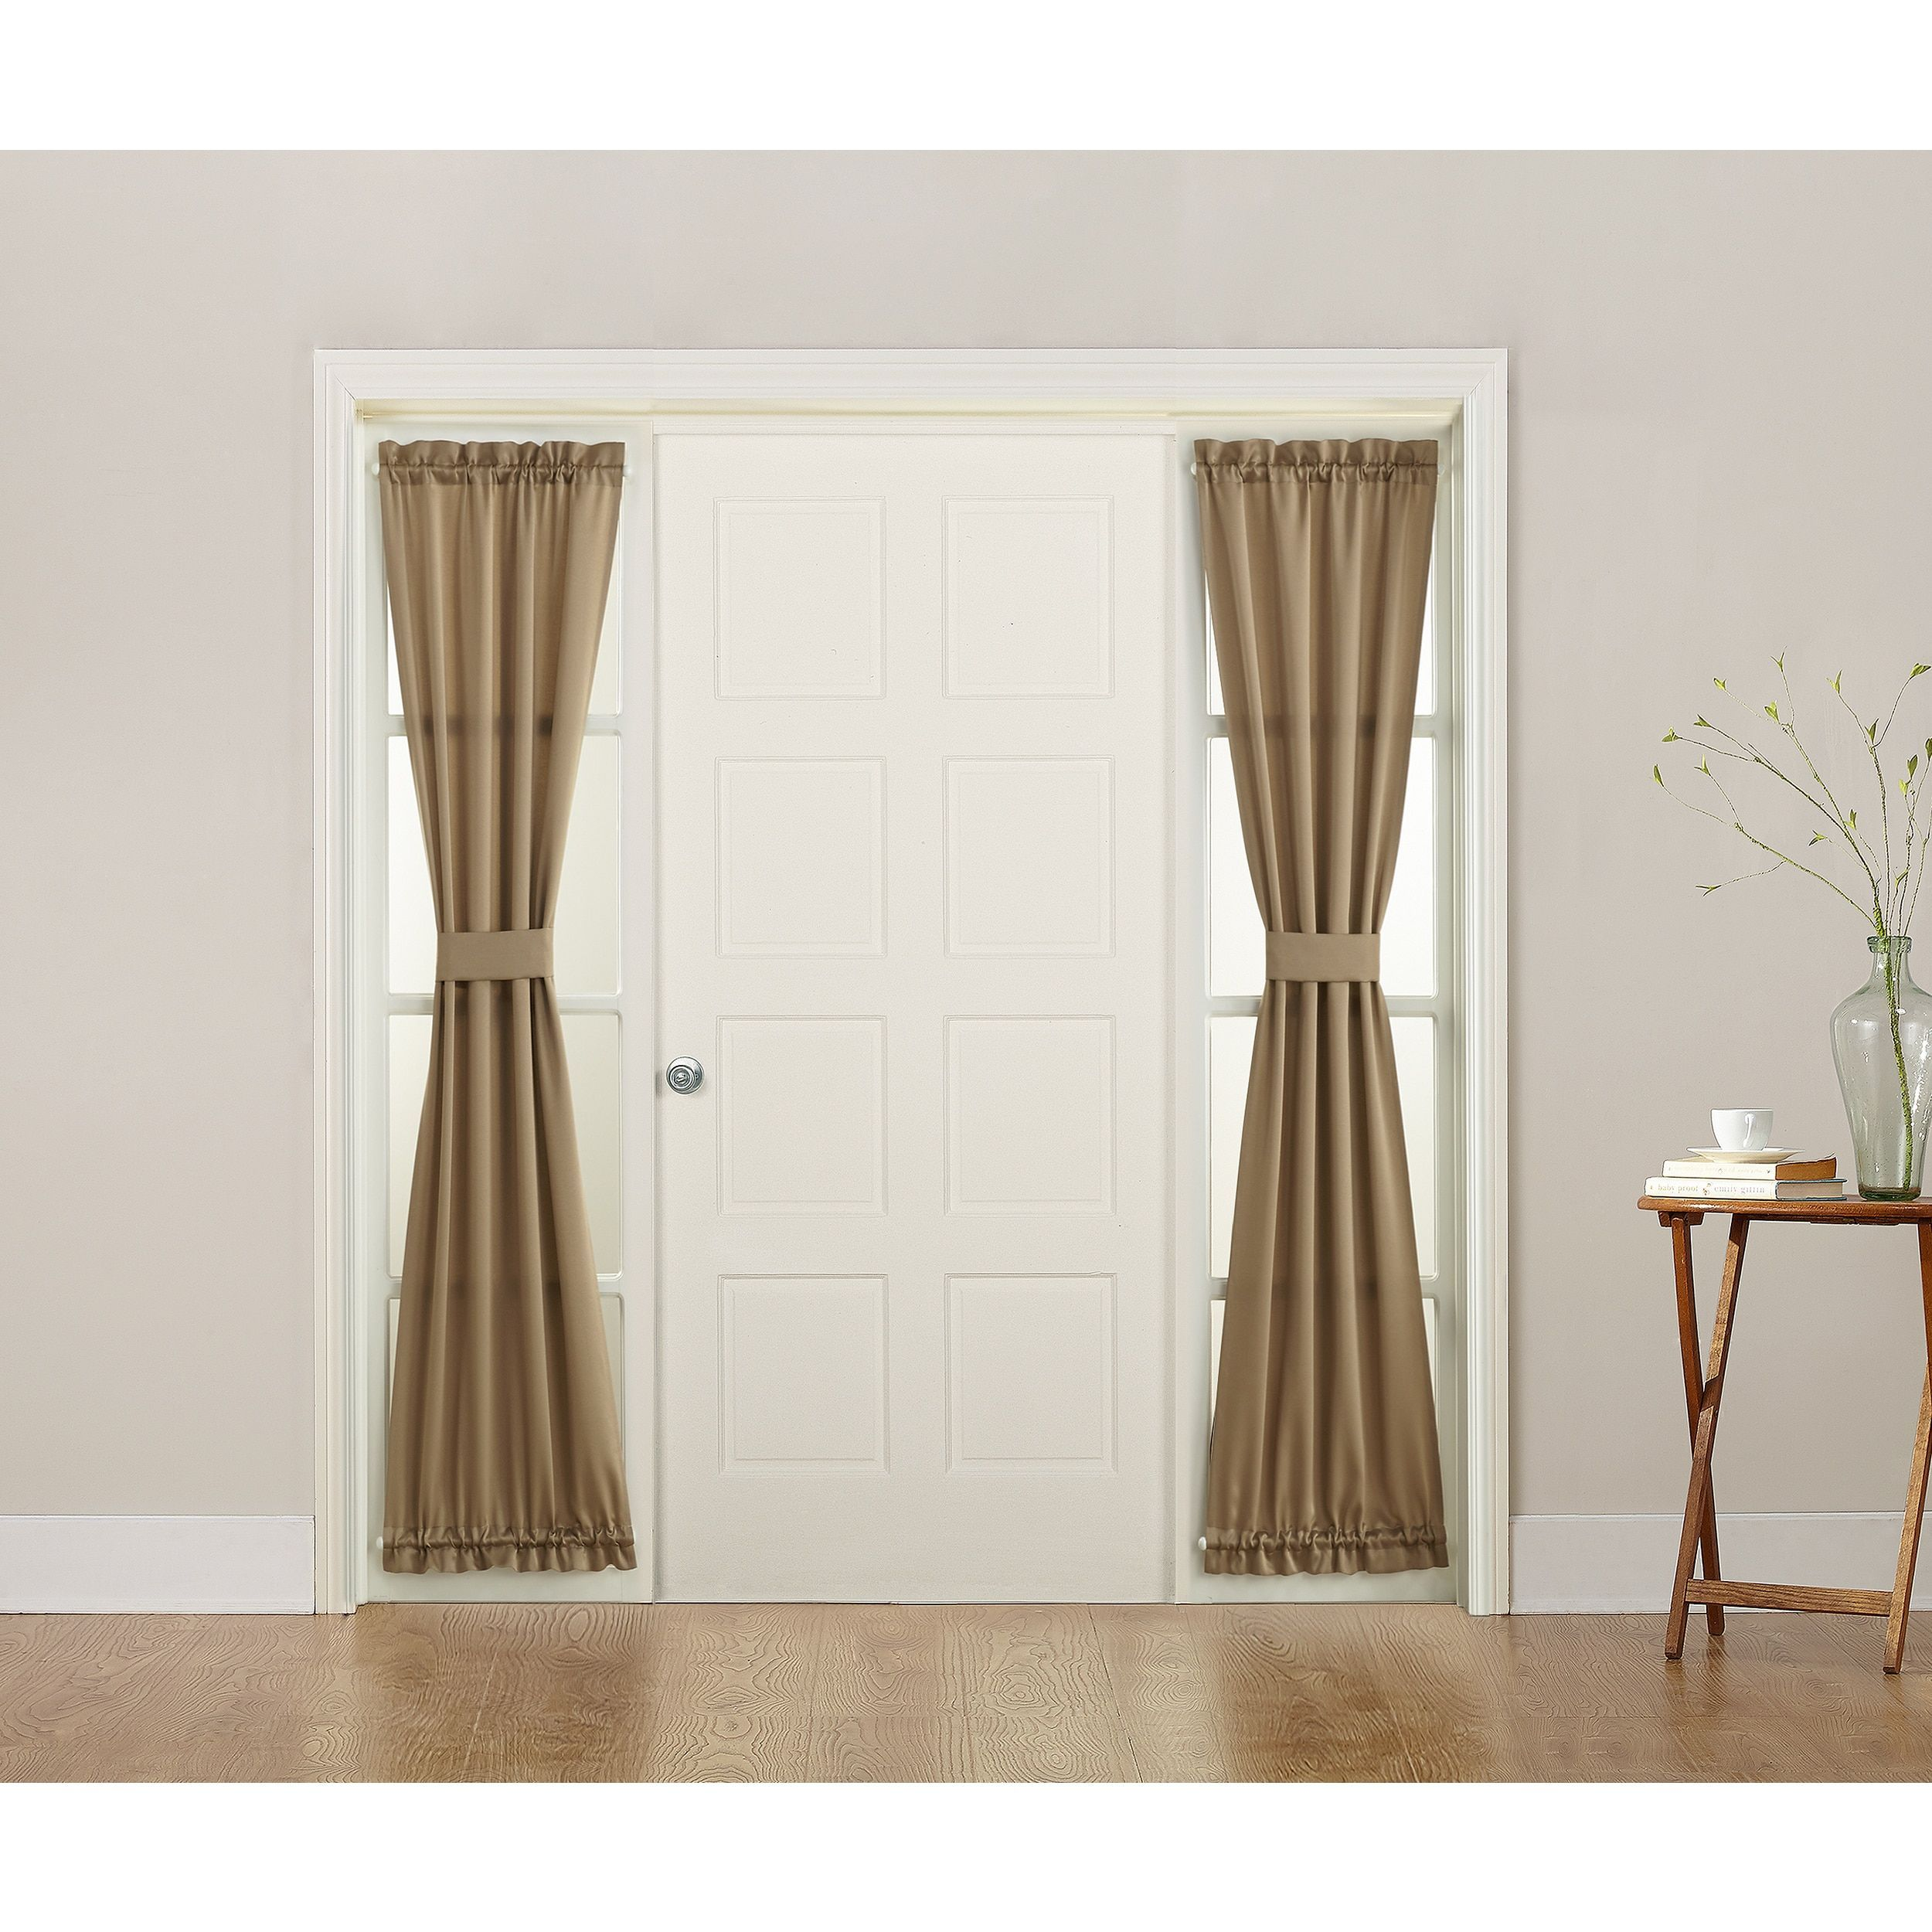 l singular curtains with curtain org handballtunisie door french target sidelight